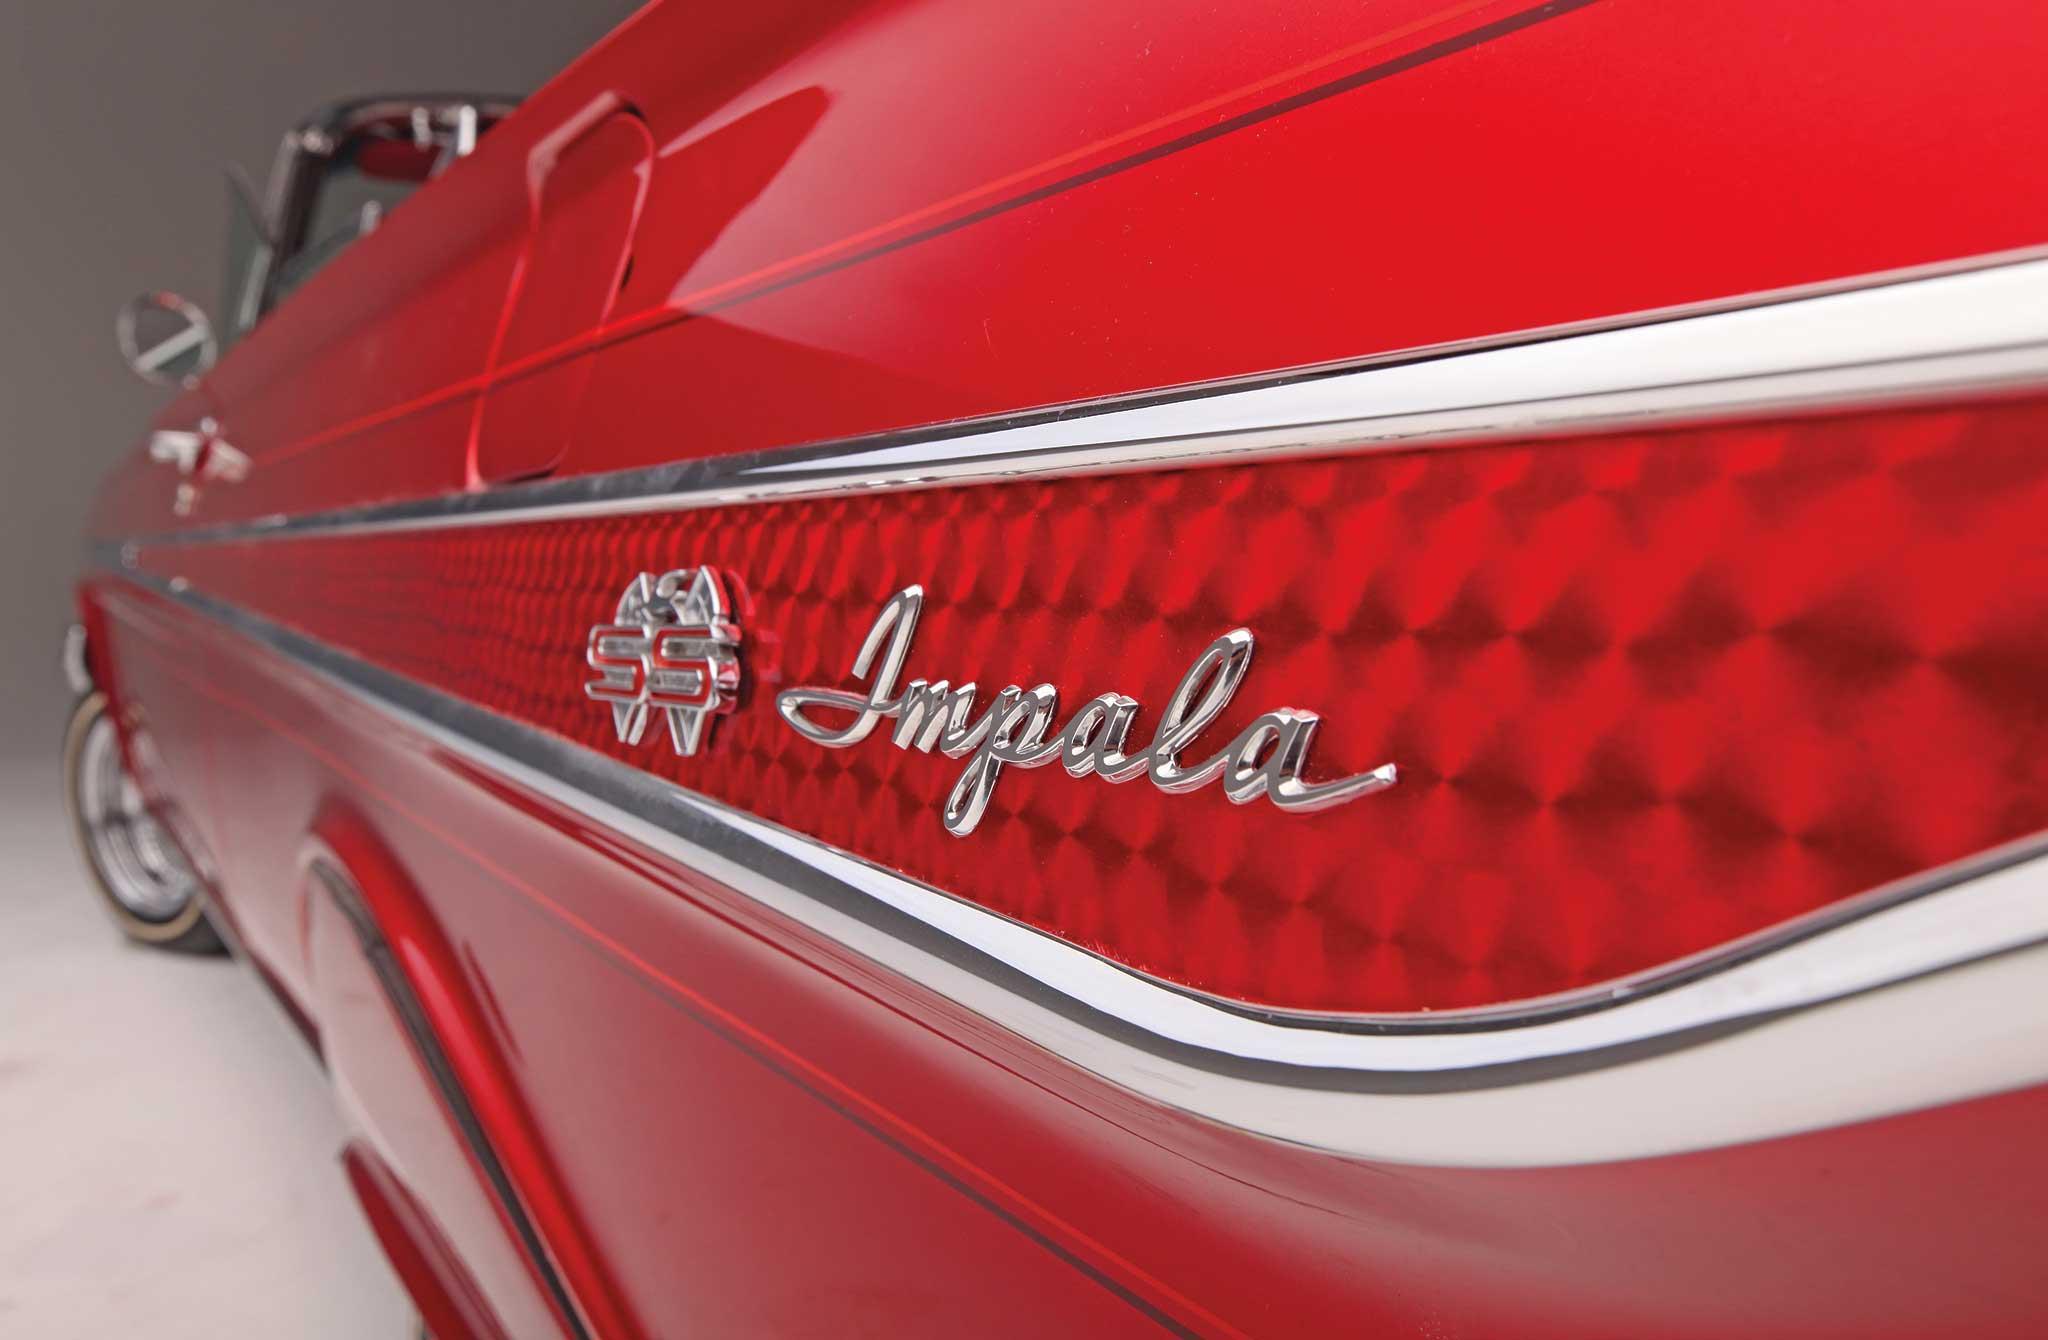 007 1961 chevrolet impala convertible impala quarter panel badge